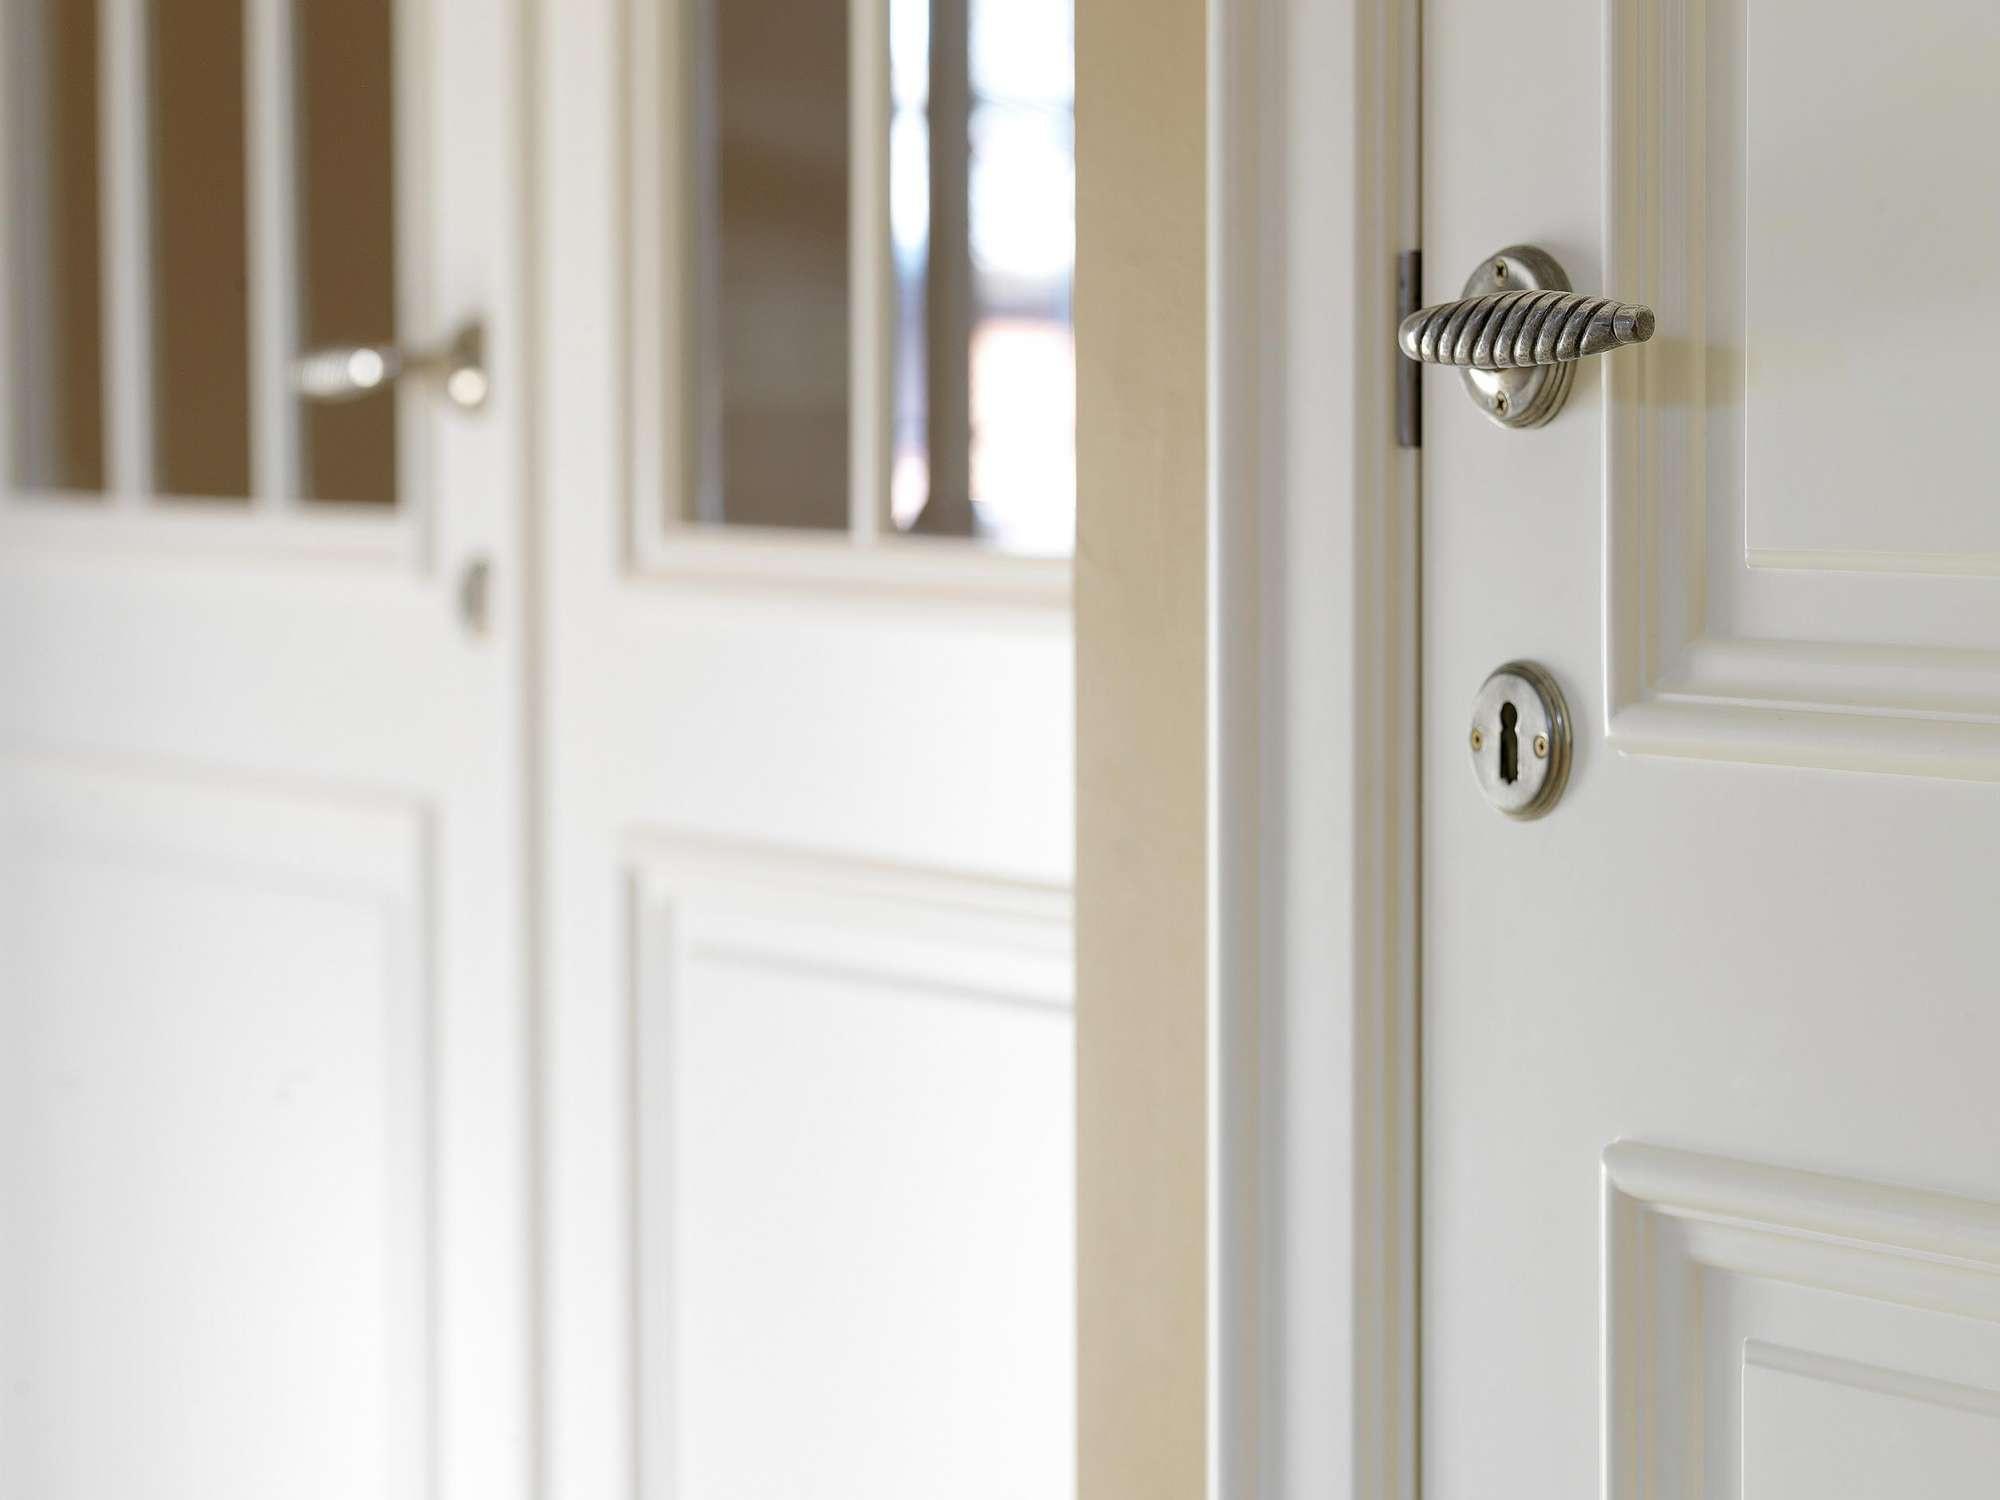 binnendeur-wit-gelakt-detail-klink